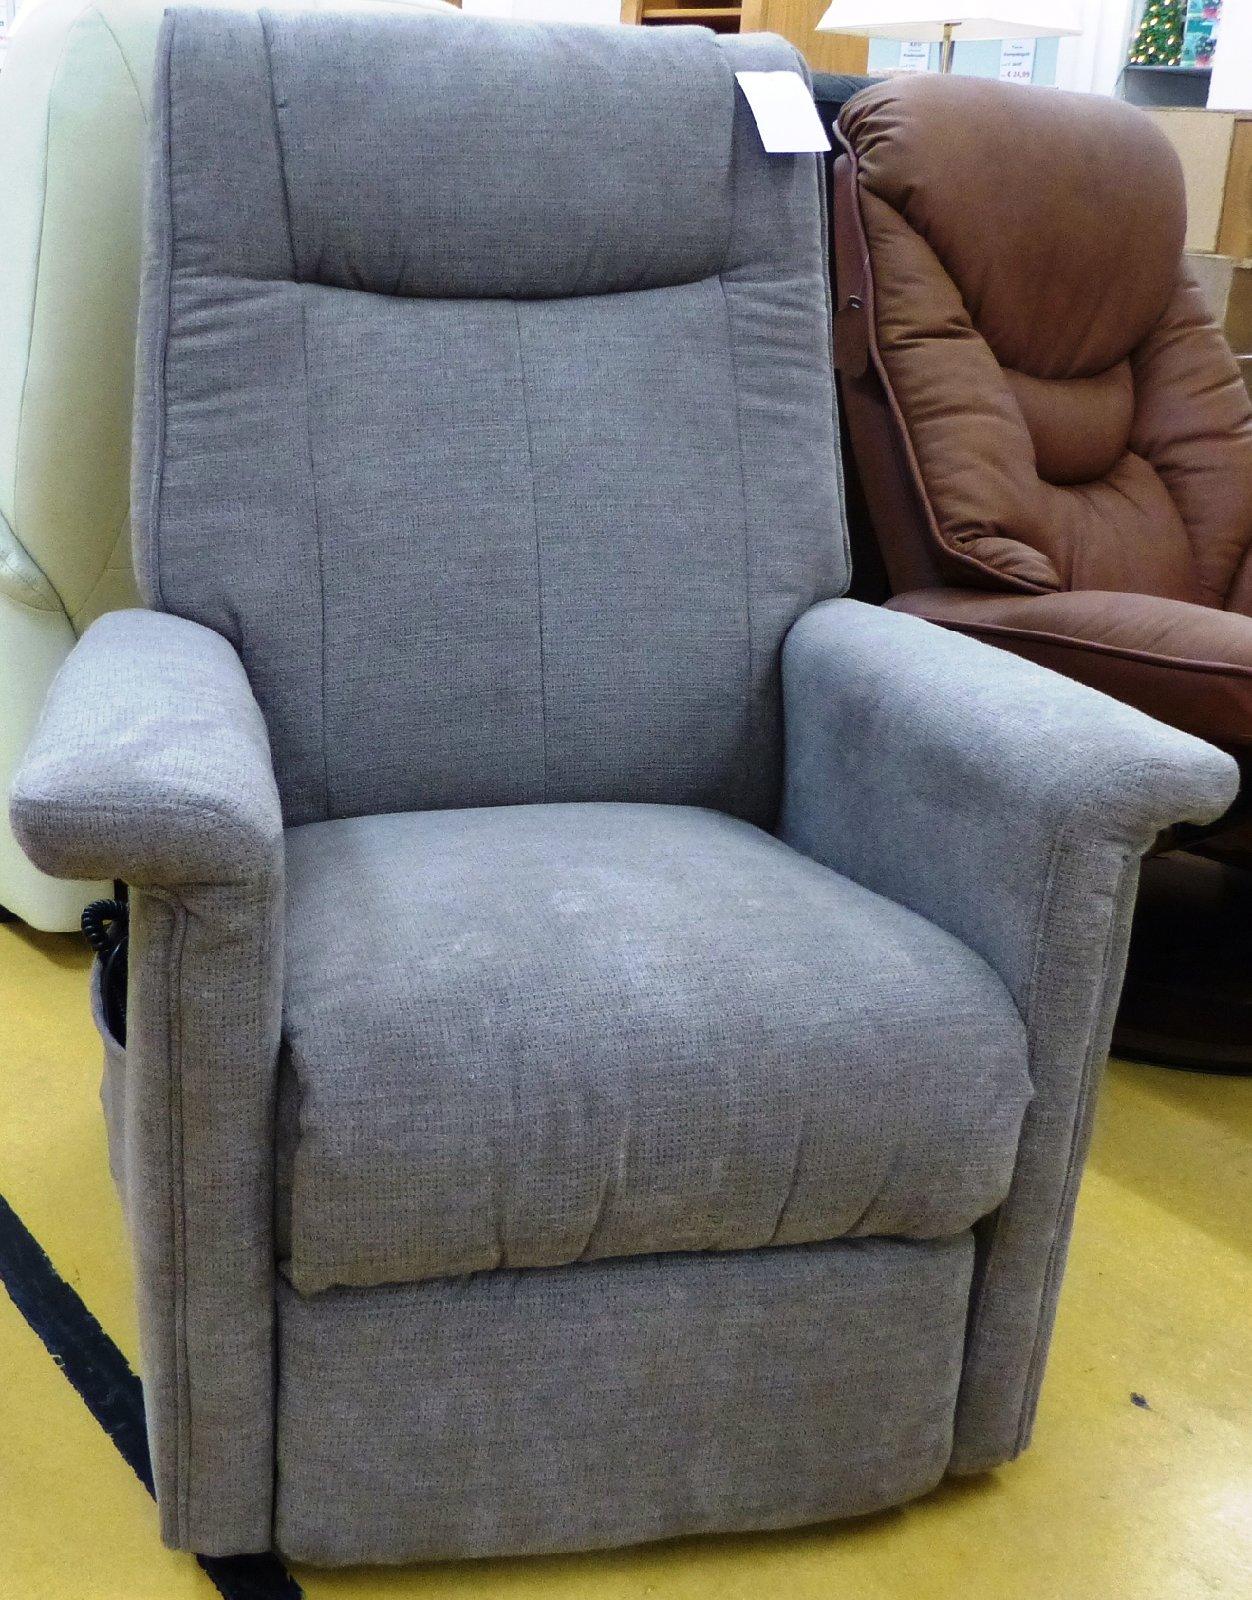 relaxsessel mit aufstehhilfe braun tv sessel sessel. Black Bedroom Furniture Sets. Home Design Ideas